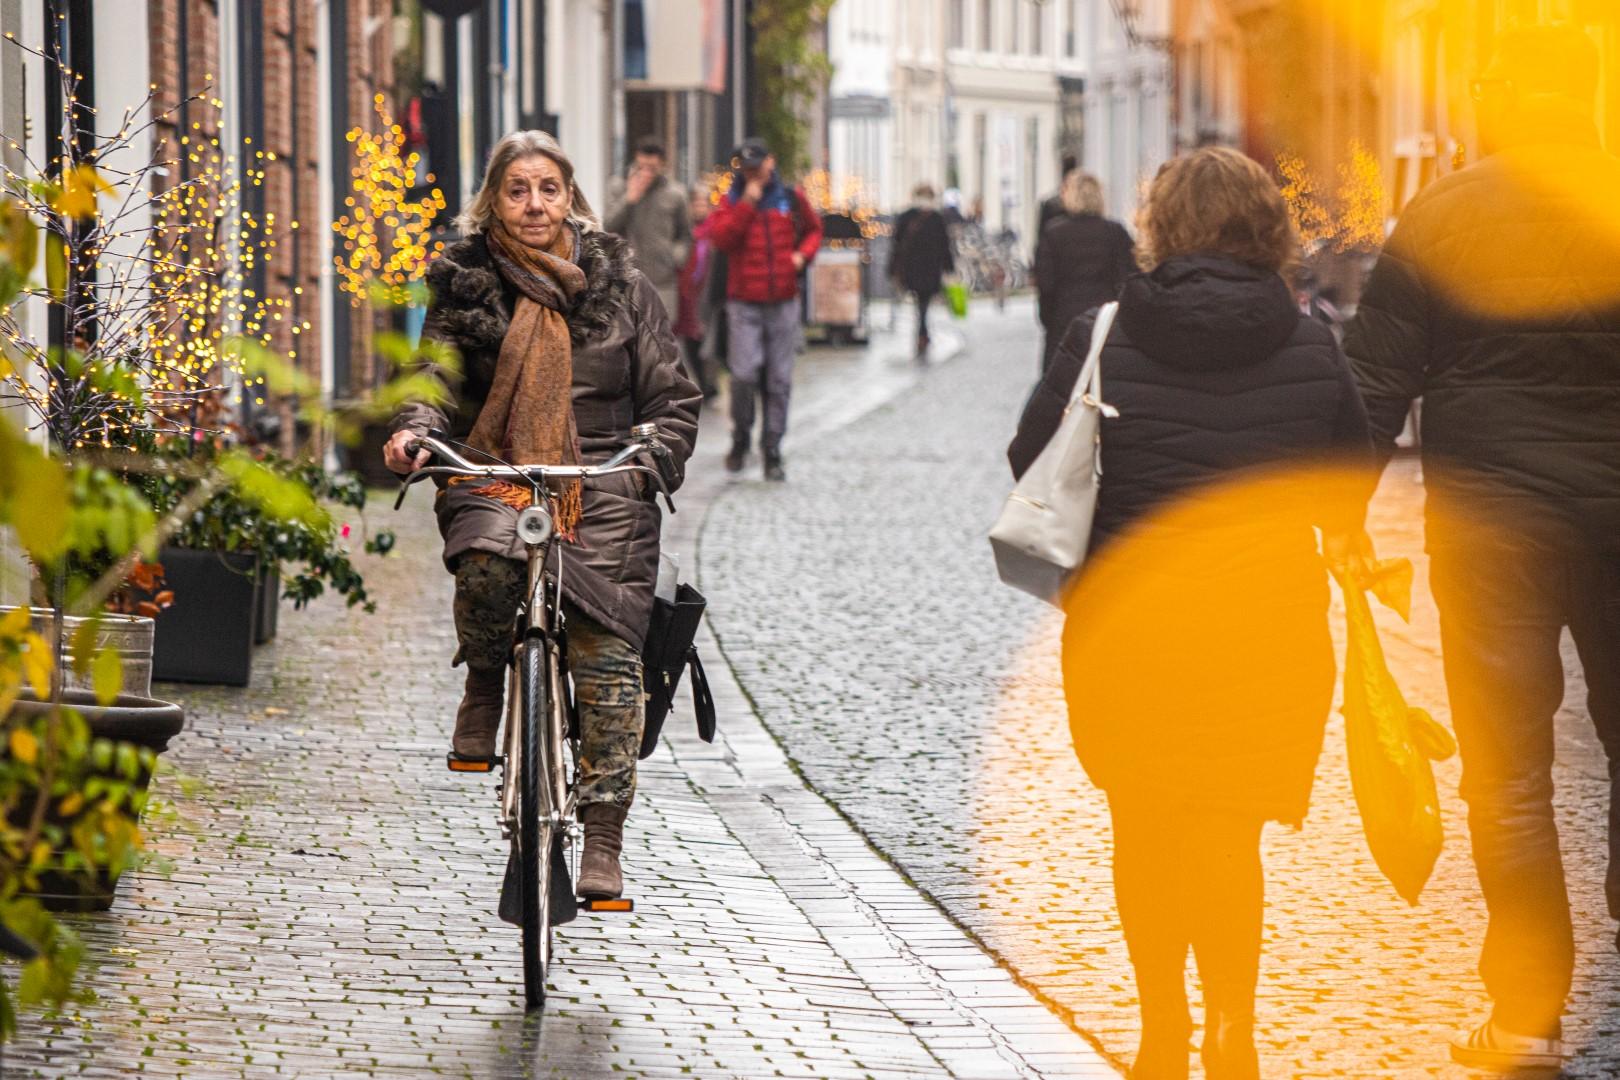 fietsen vierkantje winkelen winkelende mensen drukte shoppen winkelstraat december winter